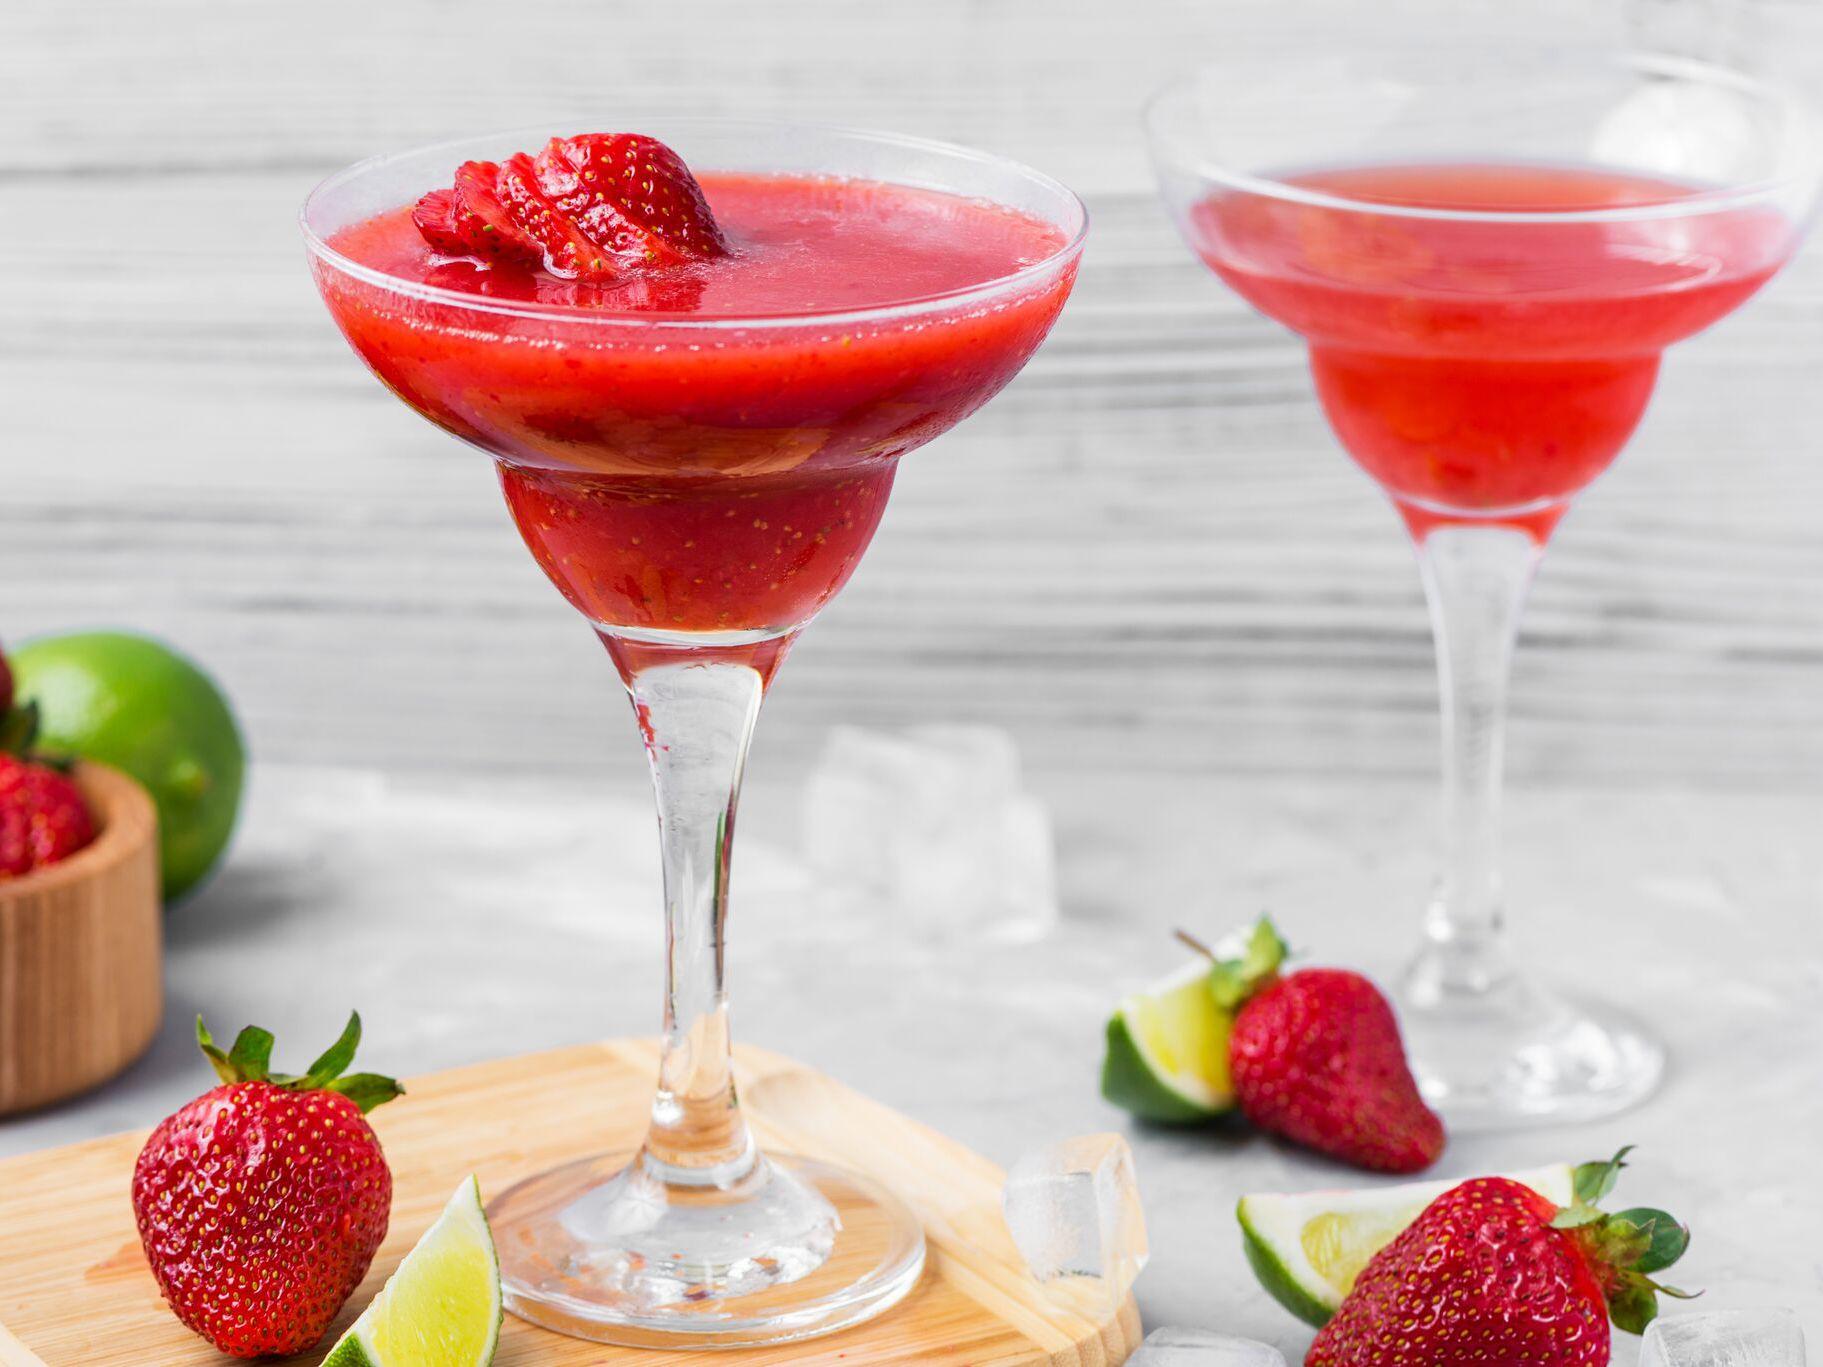 Frozen And Shaken Strawberry Daiquiri Recipes